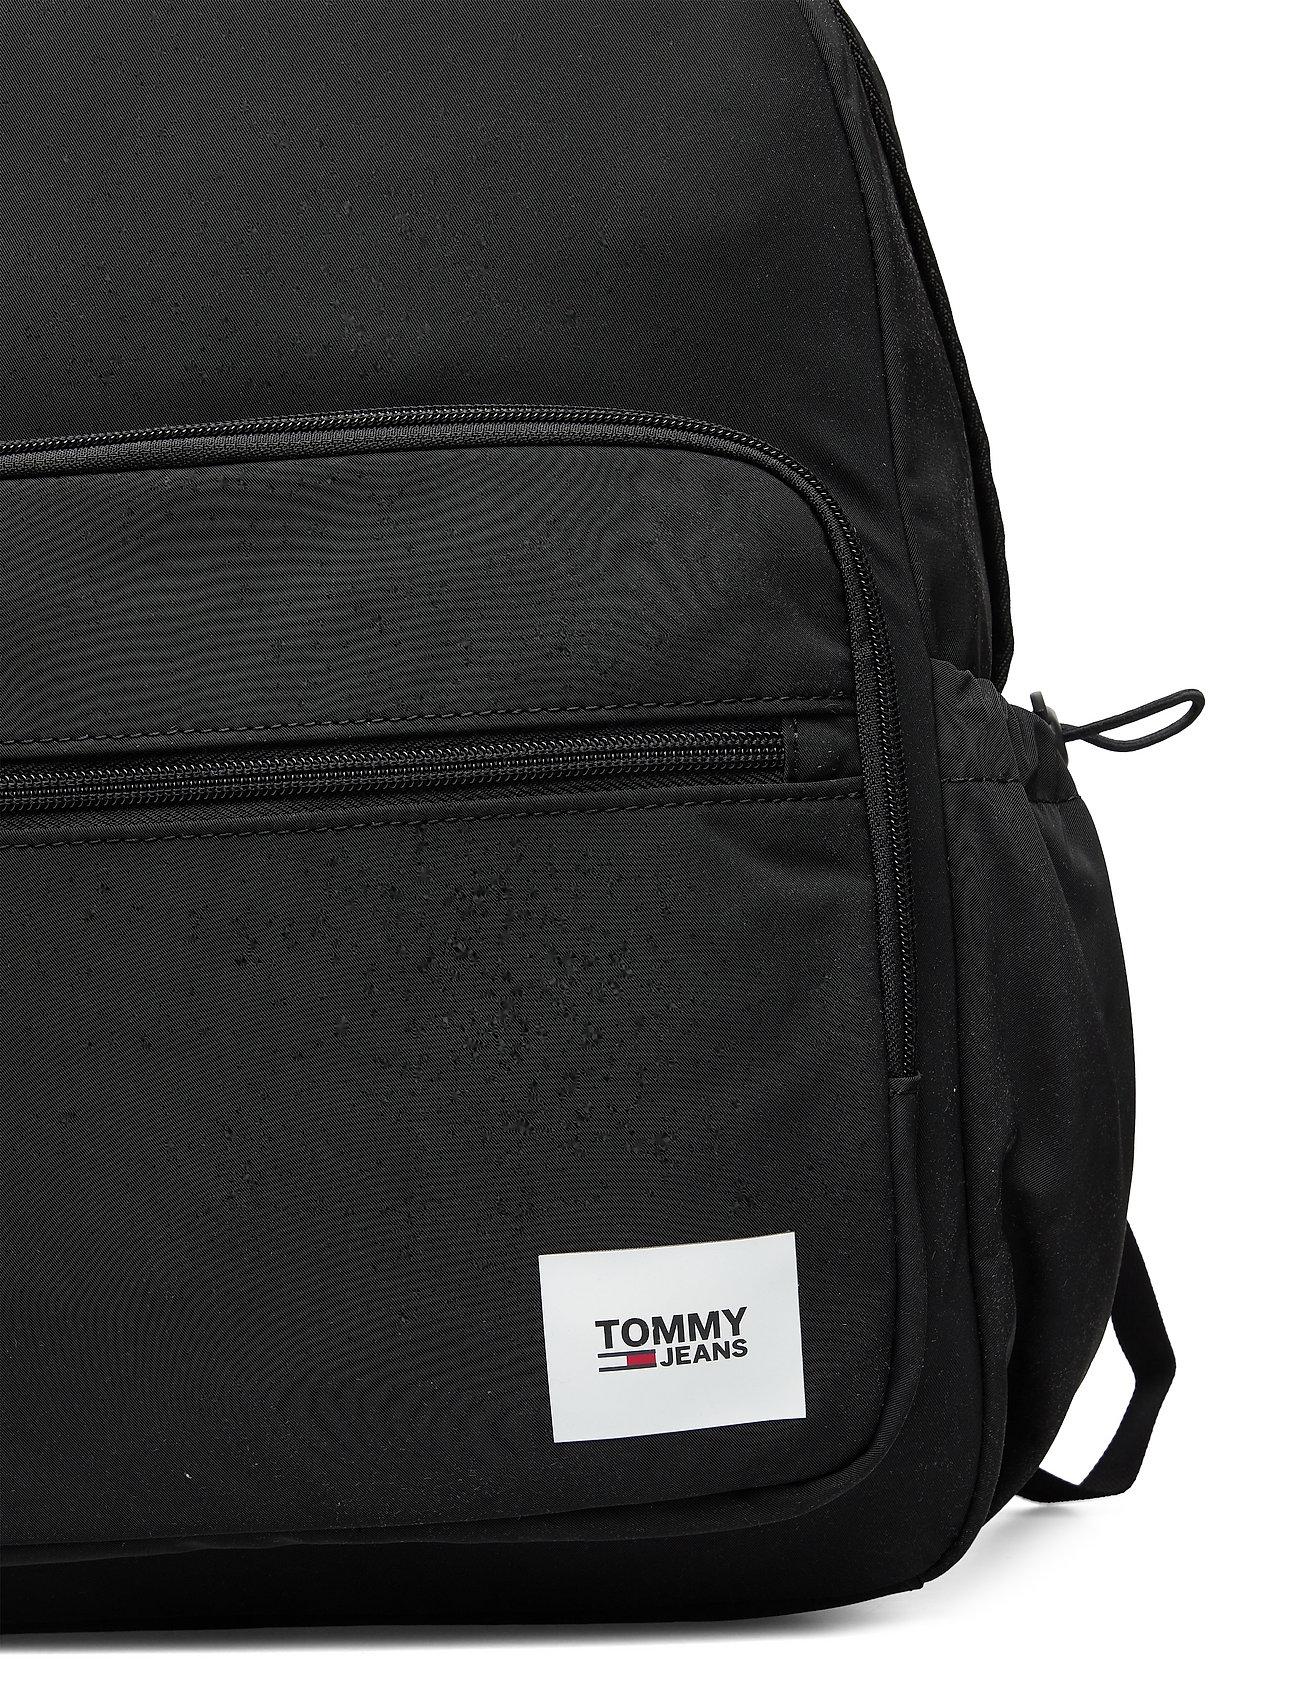 Tommy Hilfiger - TJM URBAN ESSENTIALS BACKPACK - sacs a dos - black - 3